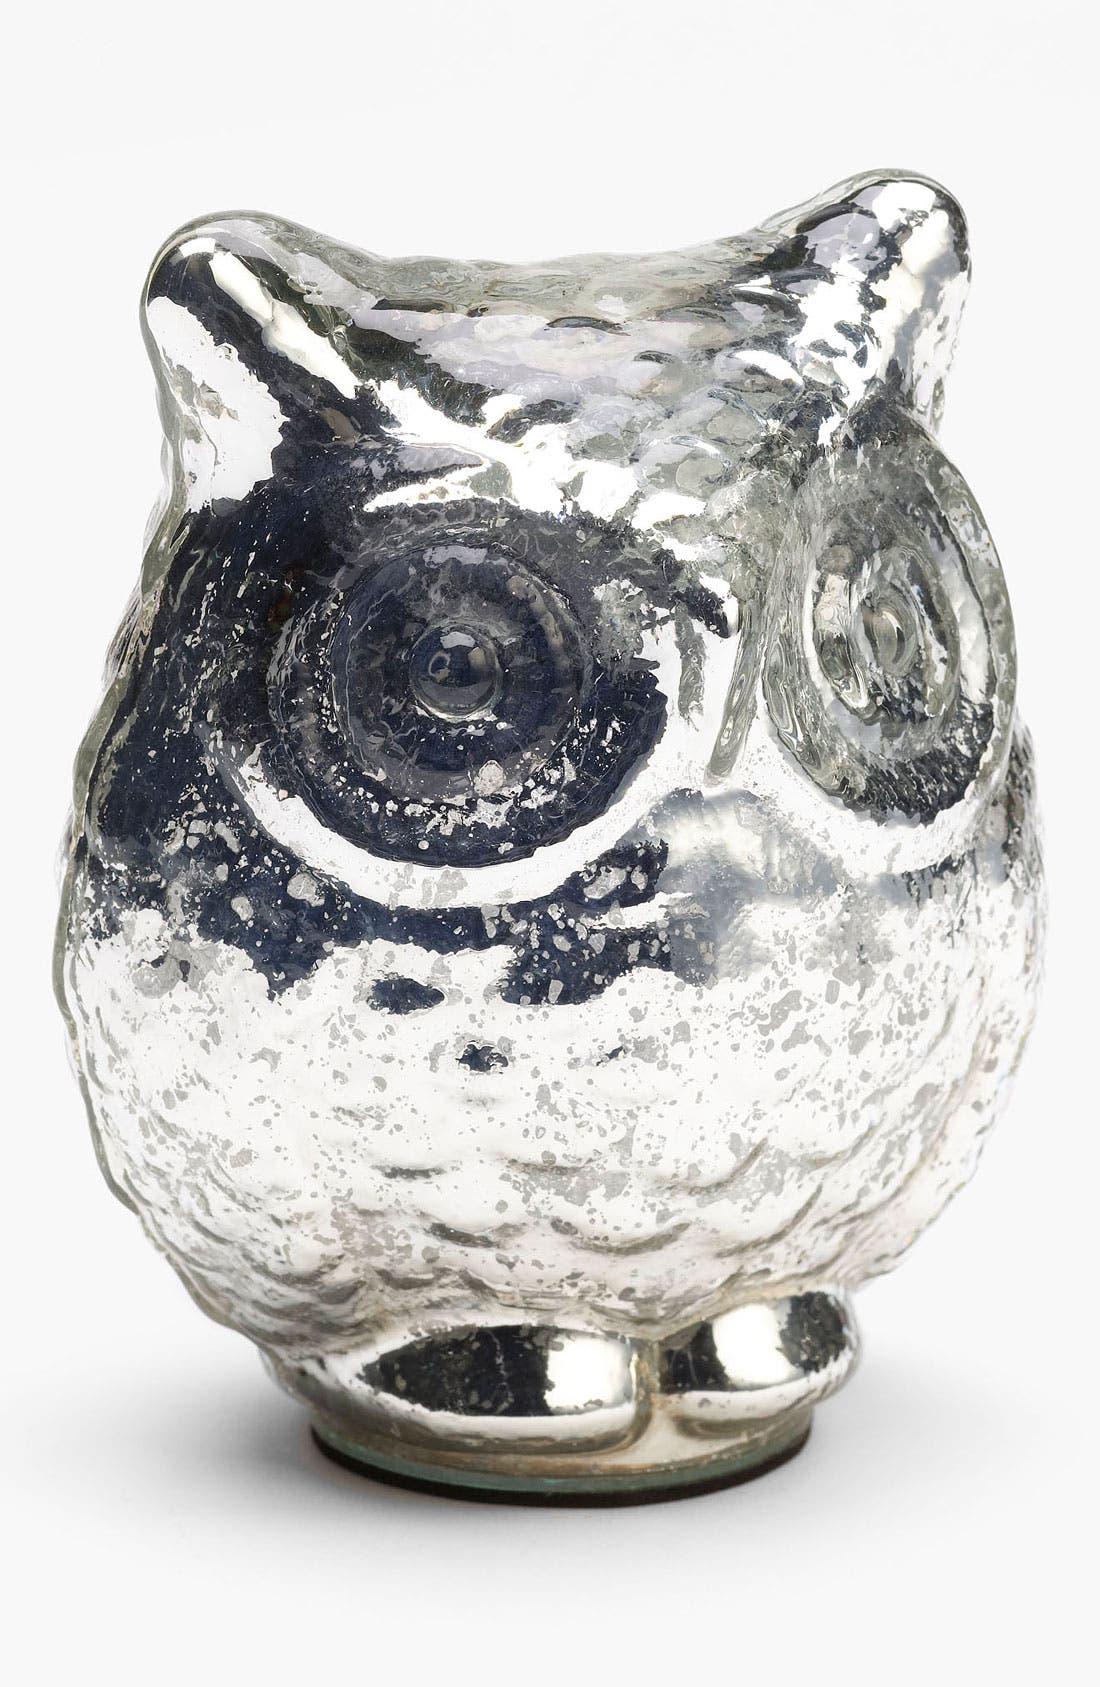 'Large' Mercury Glass Owl Decoration, Main, color, 040